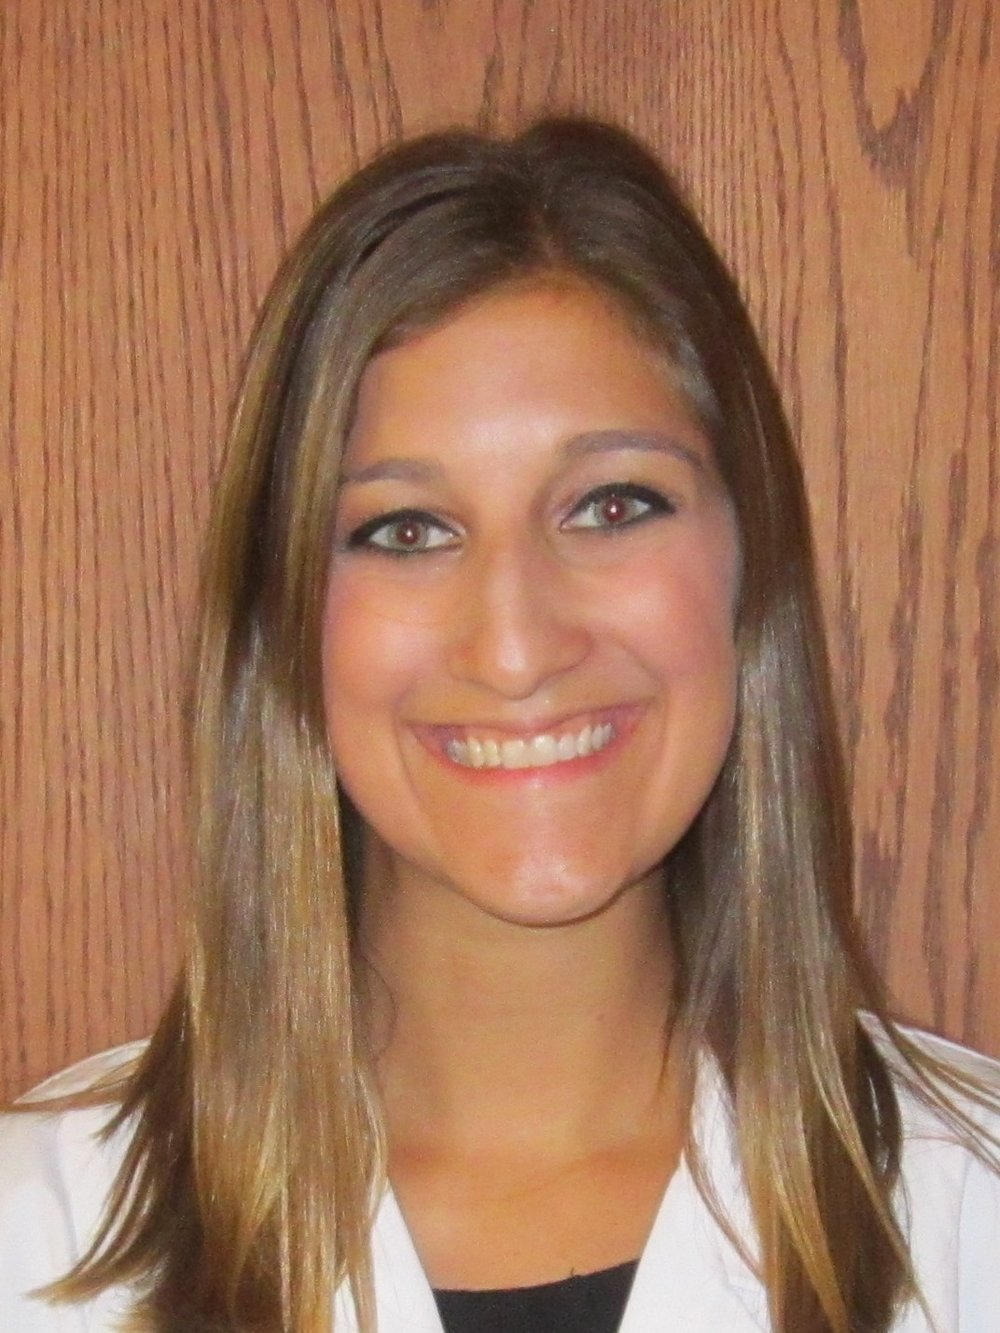 Natalie Behnke, MD - Hometown: Carol Stream, IllinoisUndergraduate: University of Illinois at Urbana ChampaignMedical School: Chicago Medical SchoolHobbies:Cooking, traveling, brunchin', college football